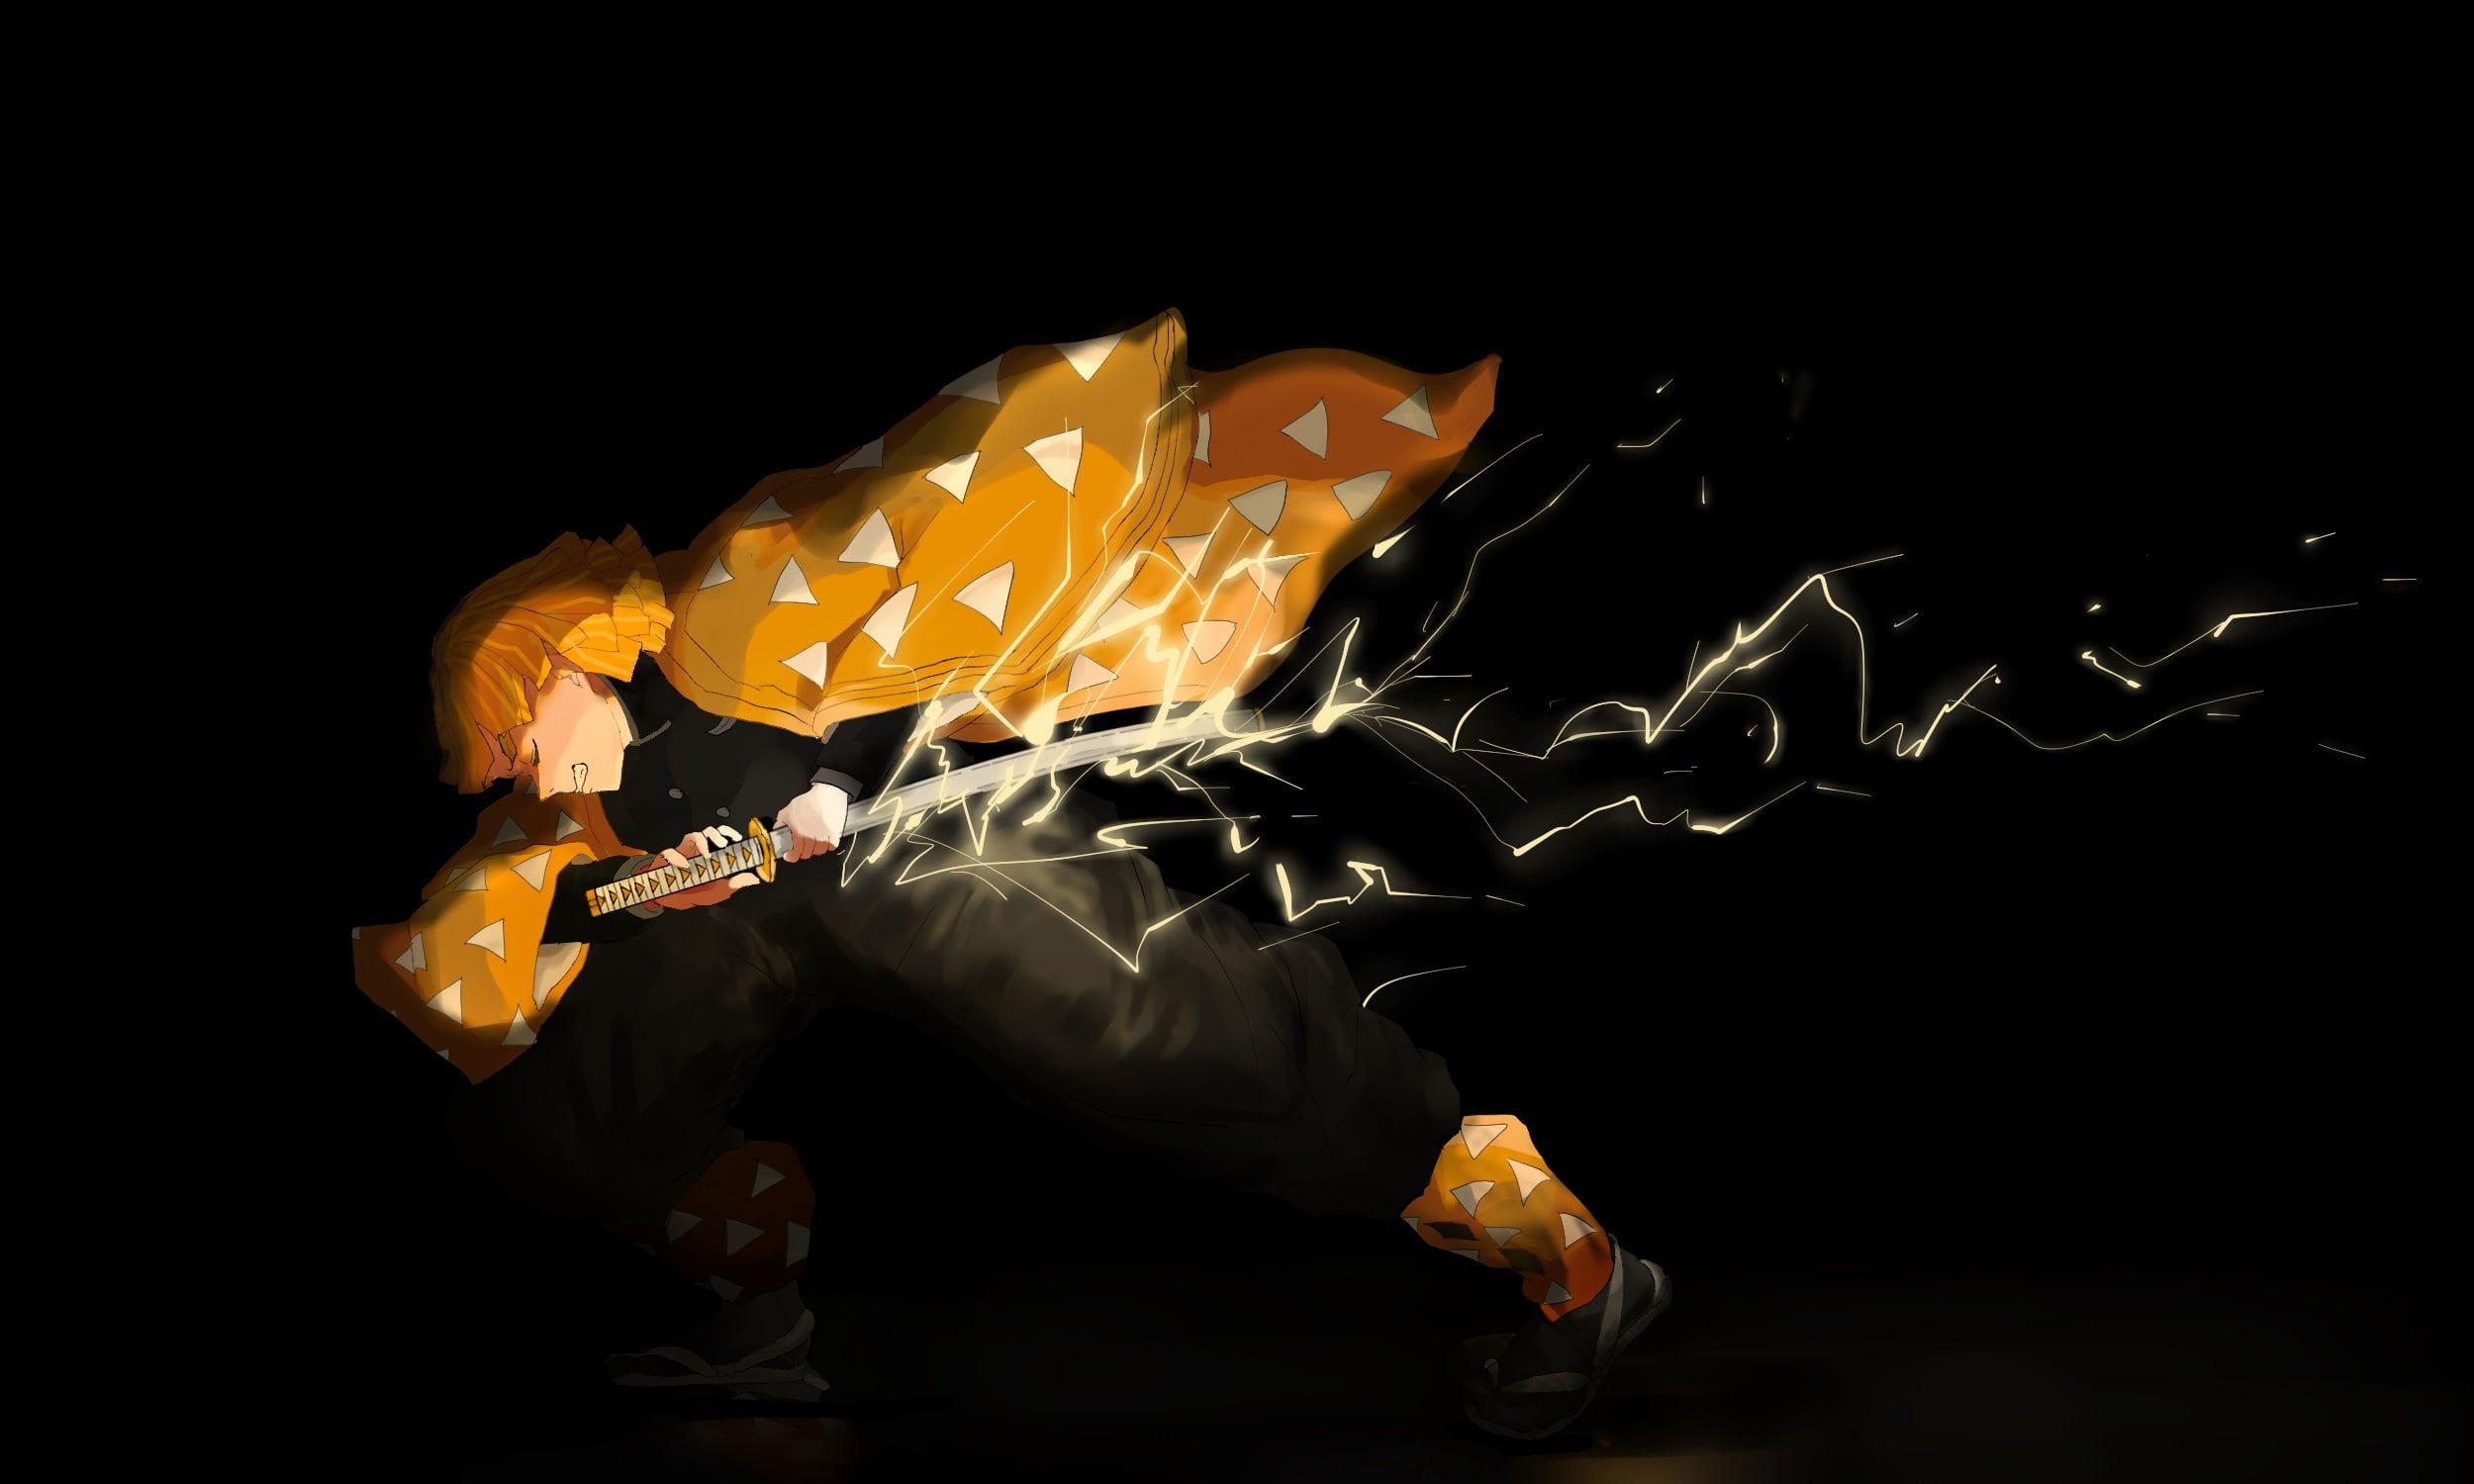 Kimetsu No Yaiba Wallpaper Anime Demon Slayer Zenitsu Agatsuma Anime Wallpaper Anime Wallpaper 1920x1080 Cute Anime Wallpaper Download this wallpaper with hd and different resolutions related wallpapers. kimetsu no yaiba wallpaper anime